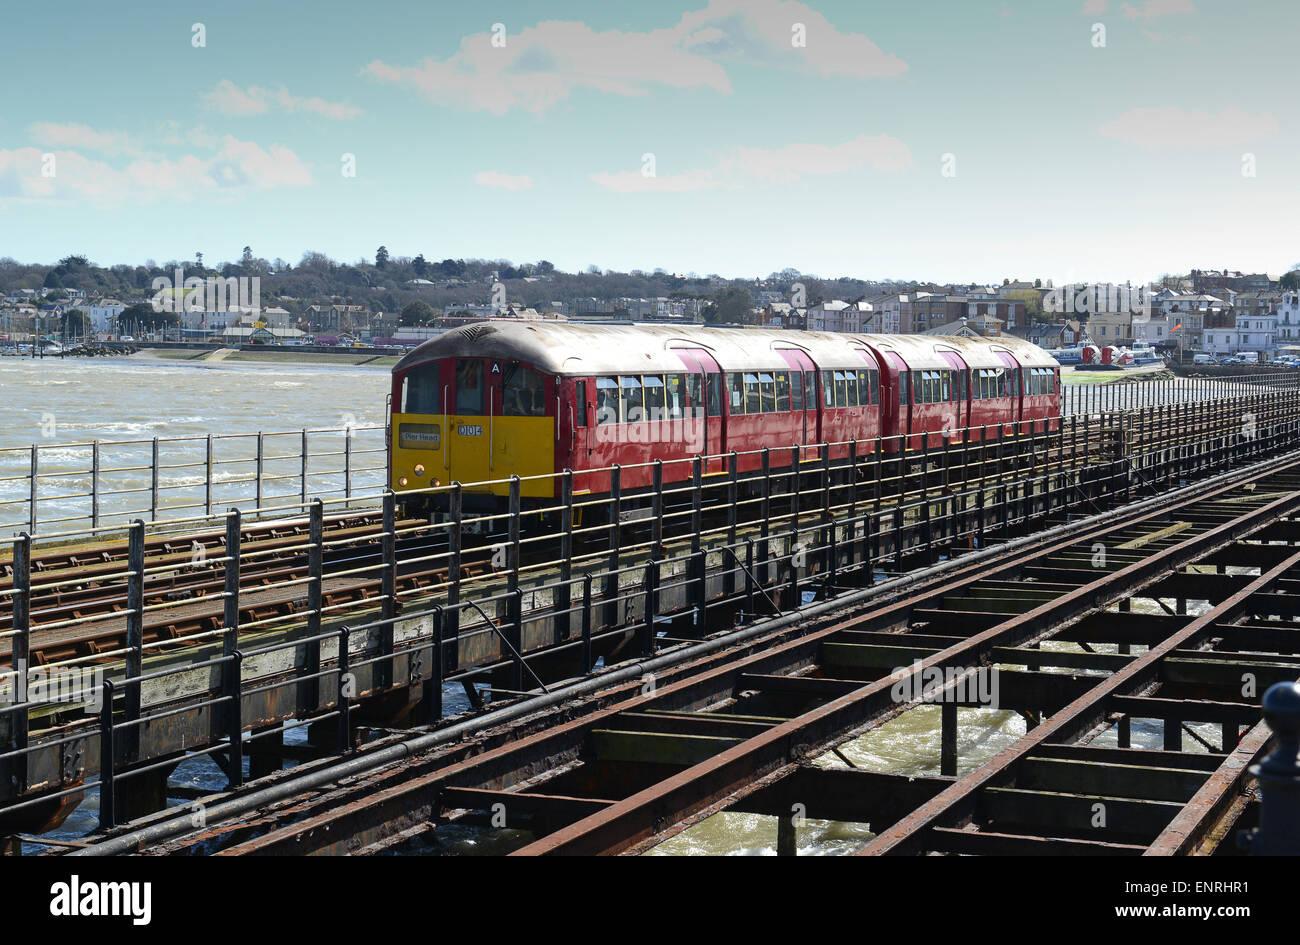 Ryde Pier railway train trains former London Underground tube train Isle of Wight - Stock Image